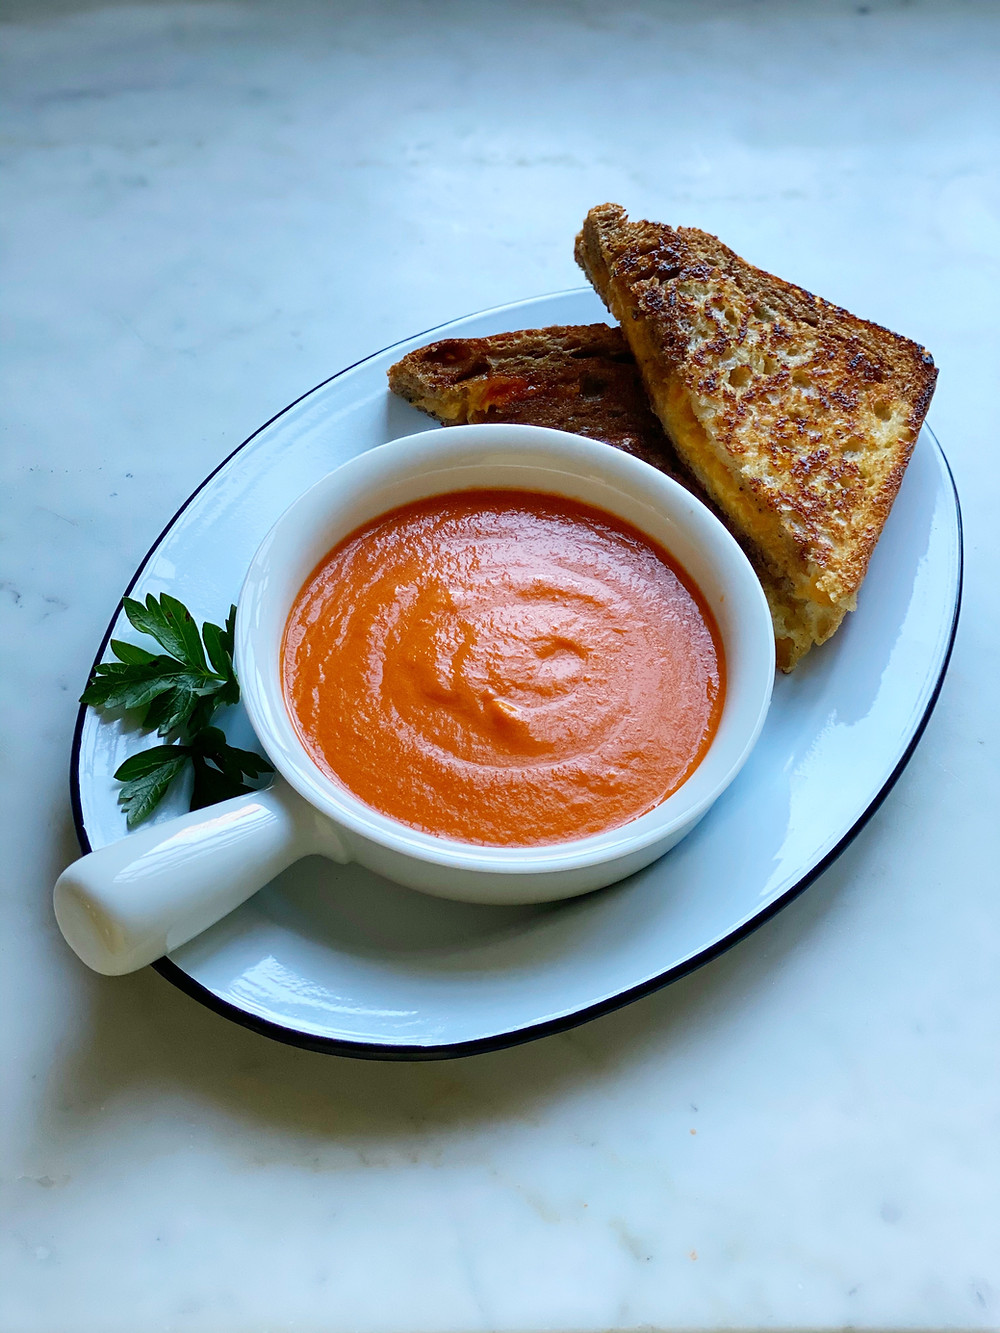 Chilled Orange-Tomato Soup